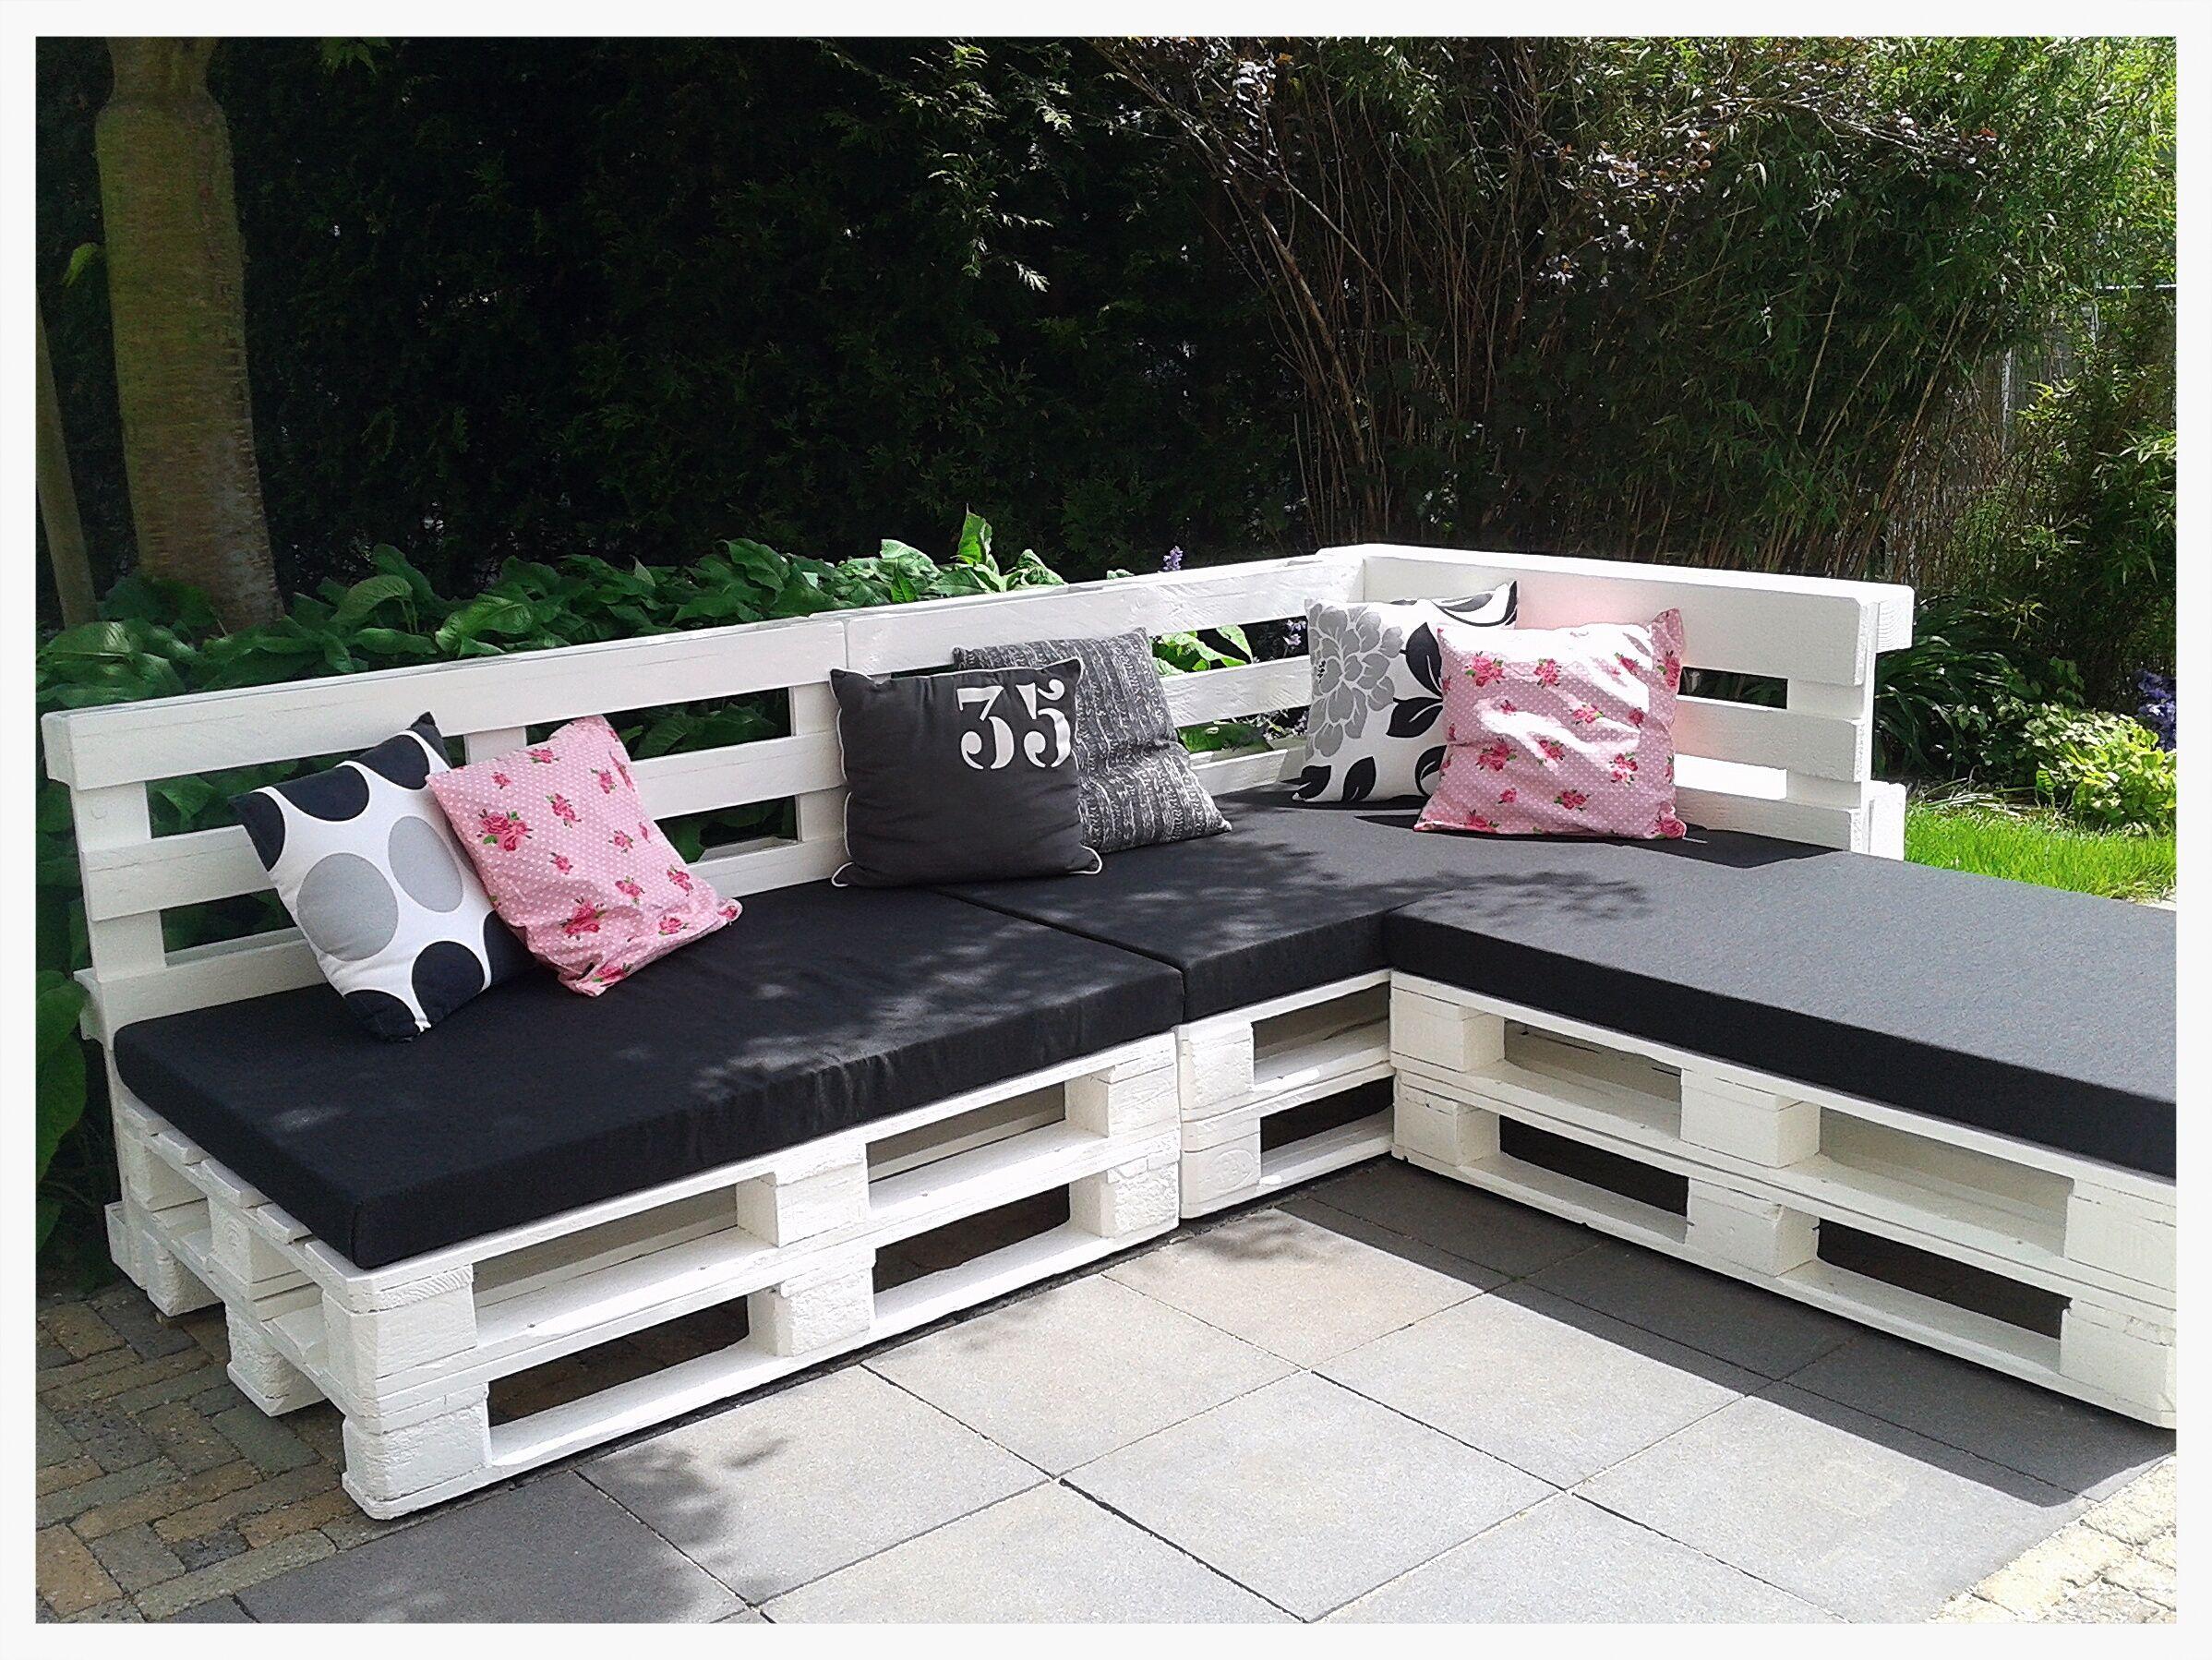 Diy Our Lounge Sofa Made Of Pallets Paletten Kissen Sofa